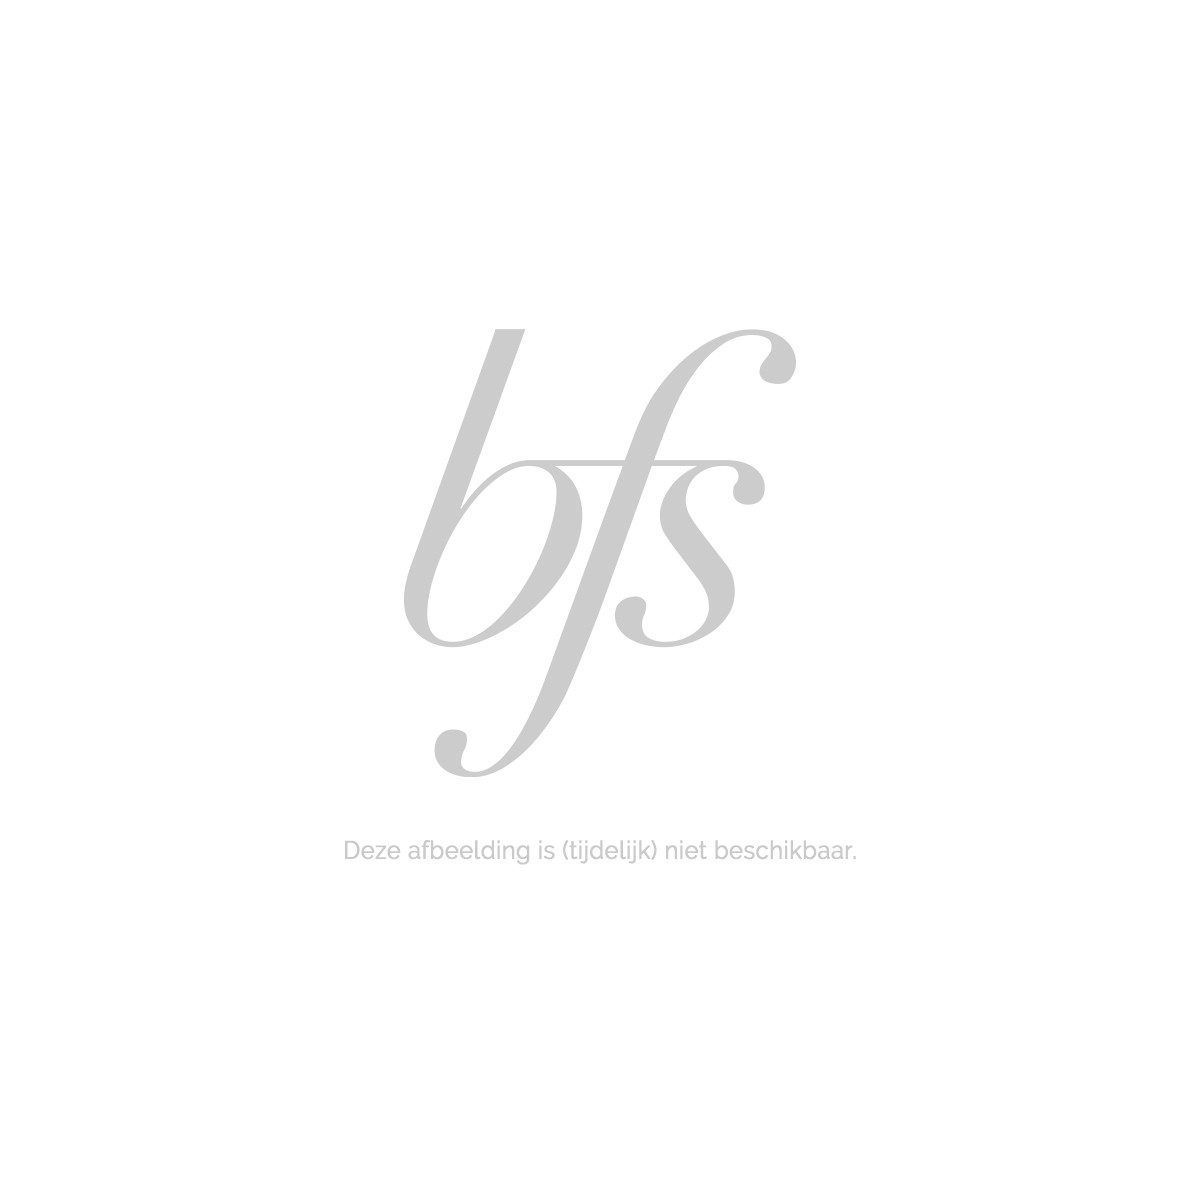 Estee Lauder New Dimension Shape+ Fill Expert Serum 50 Ml